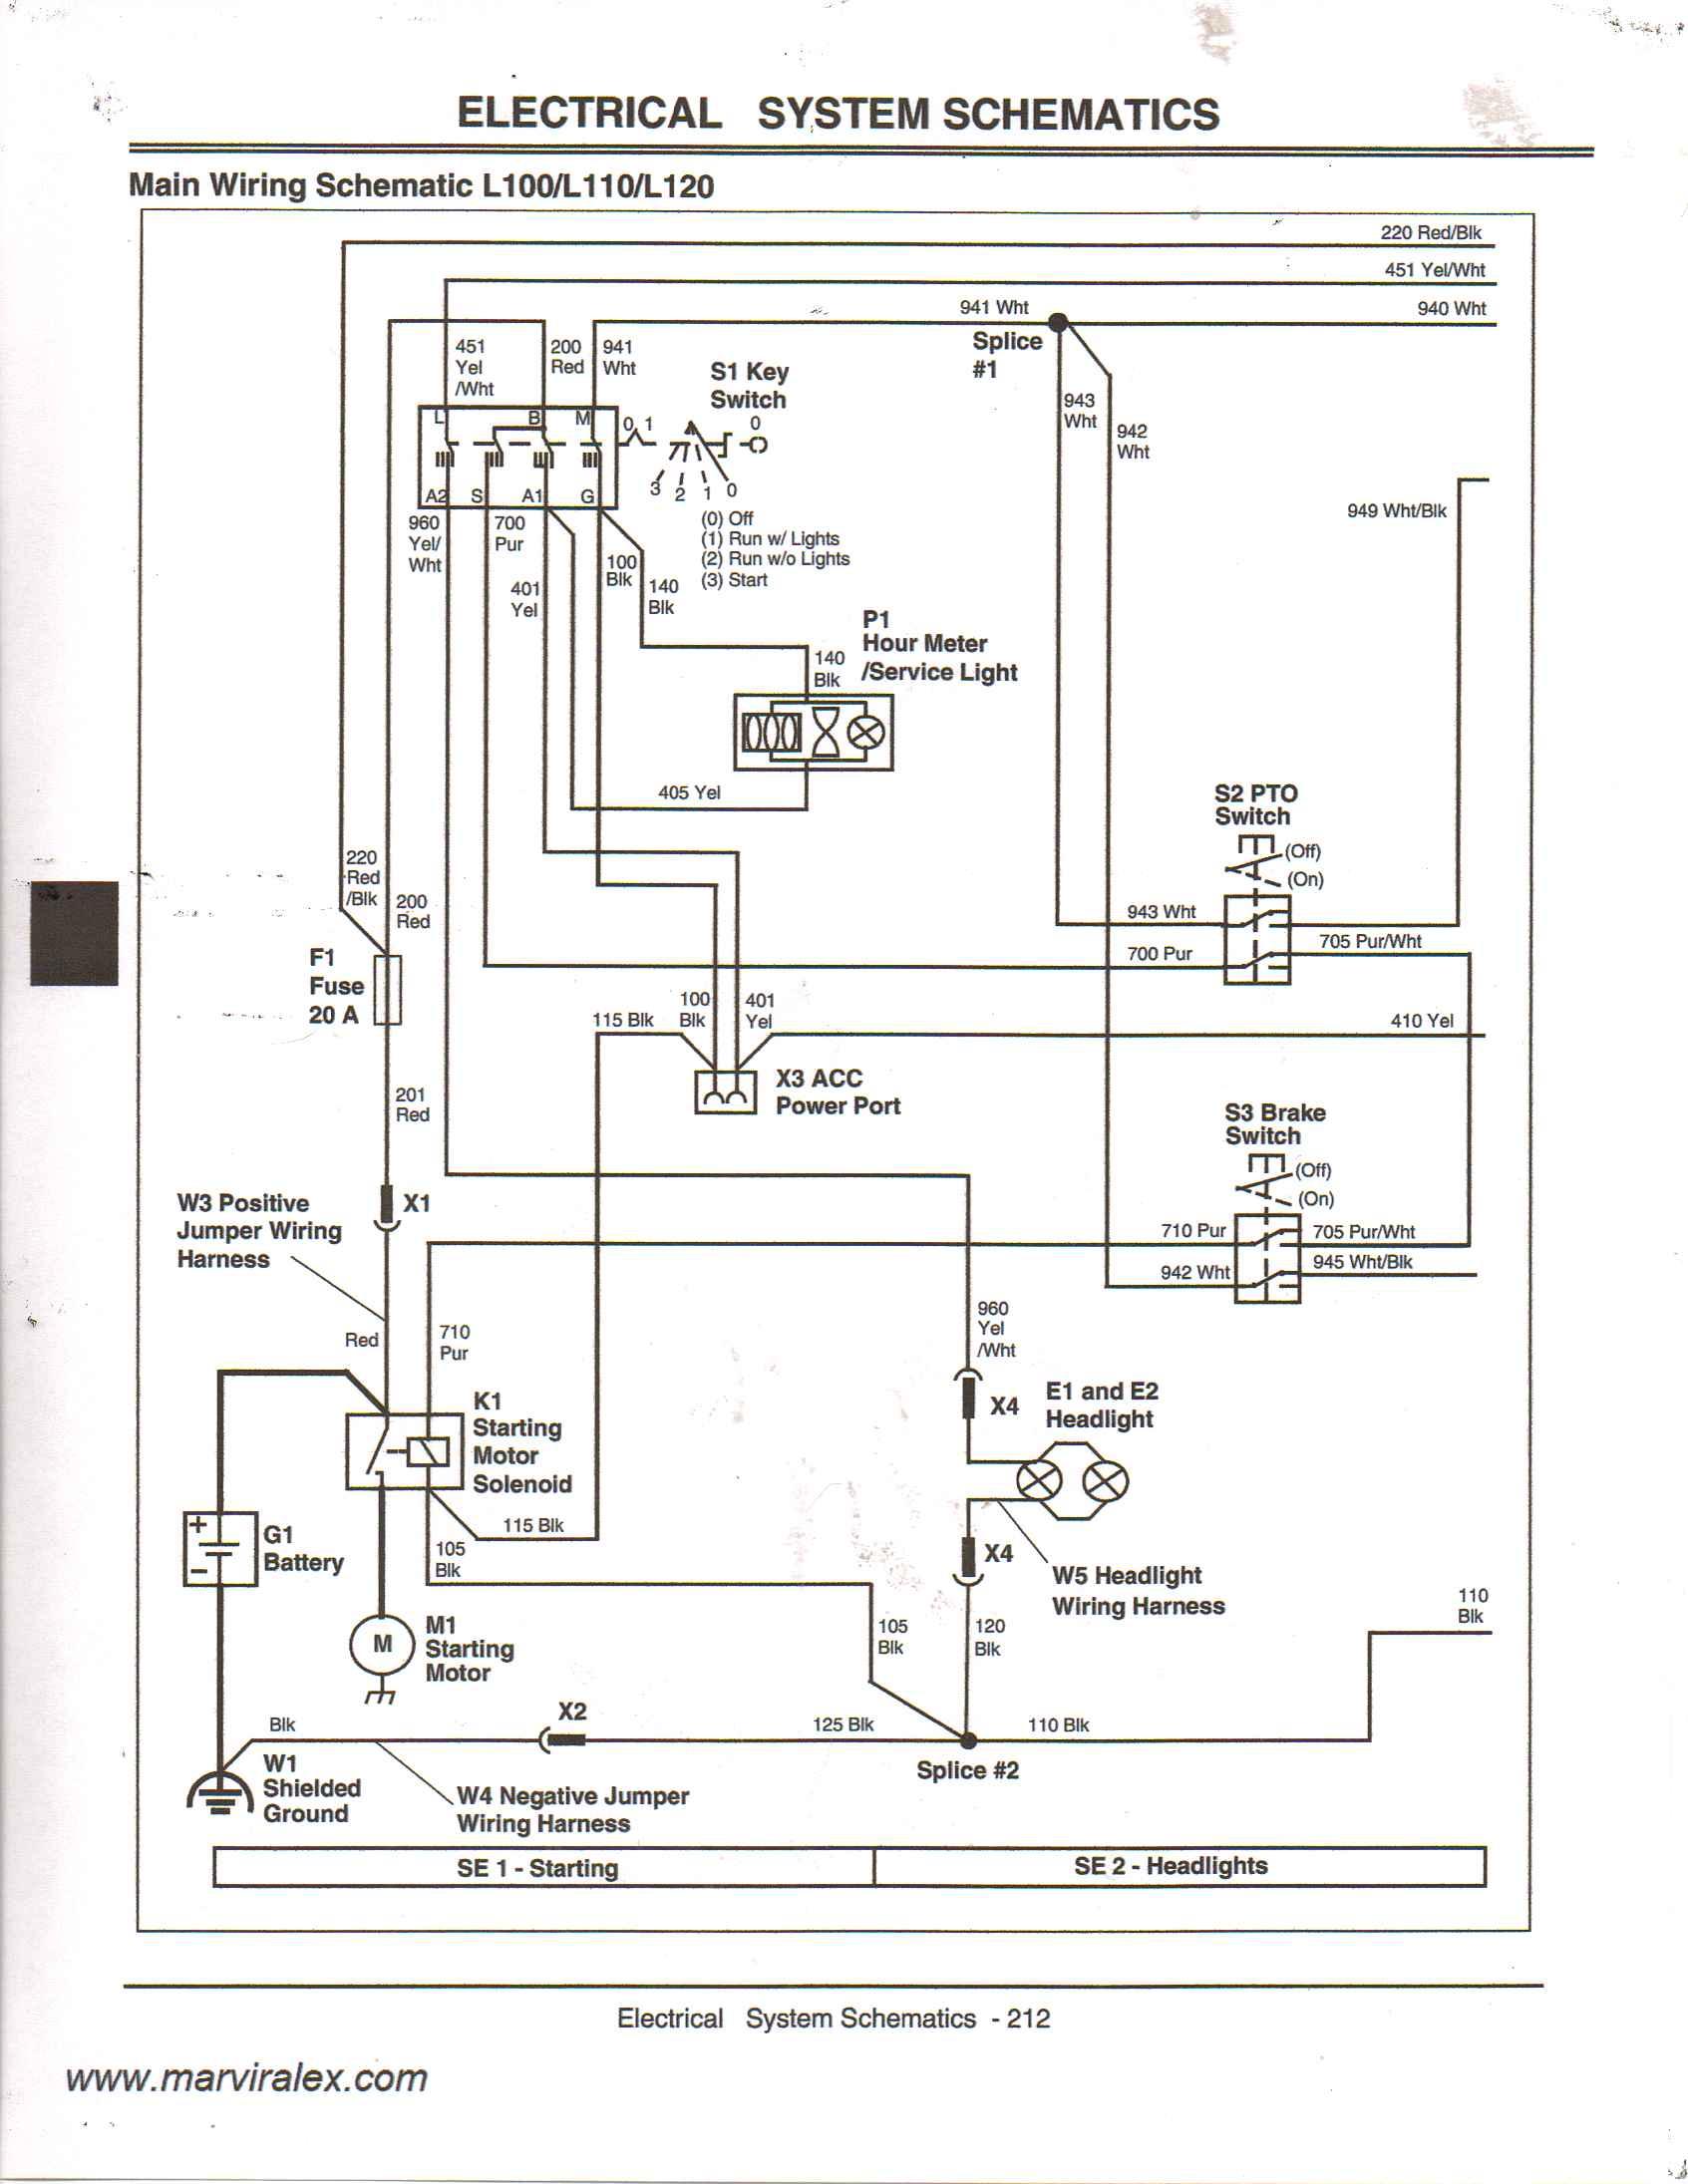 John Deere L110 Wiring Schematic - Today Diagram Database on